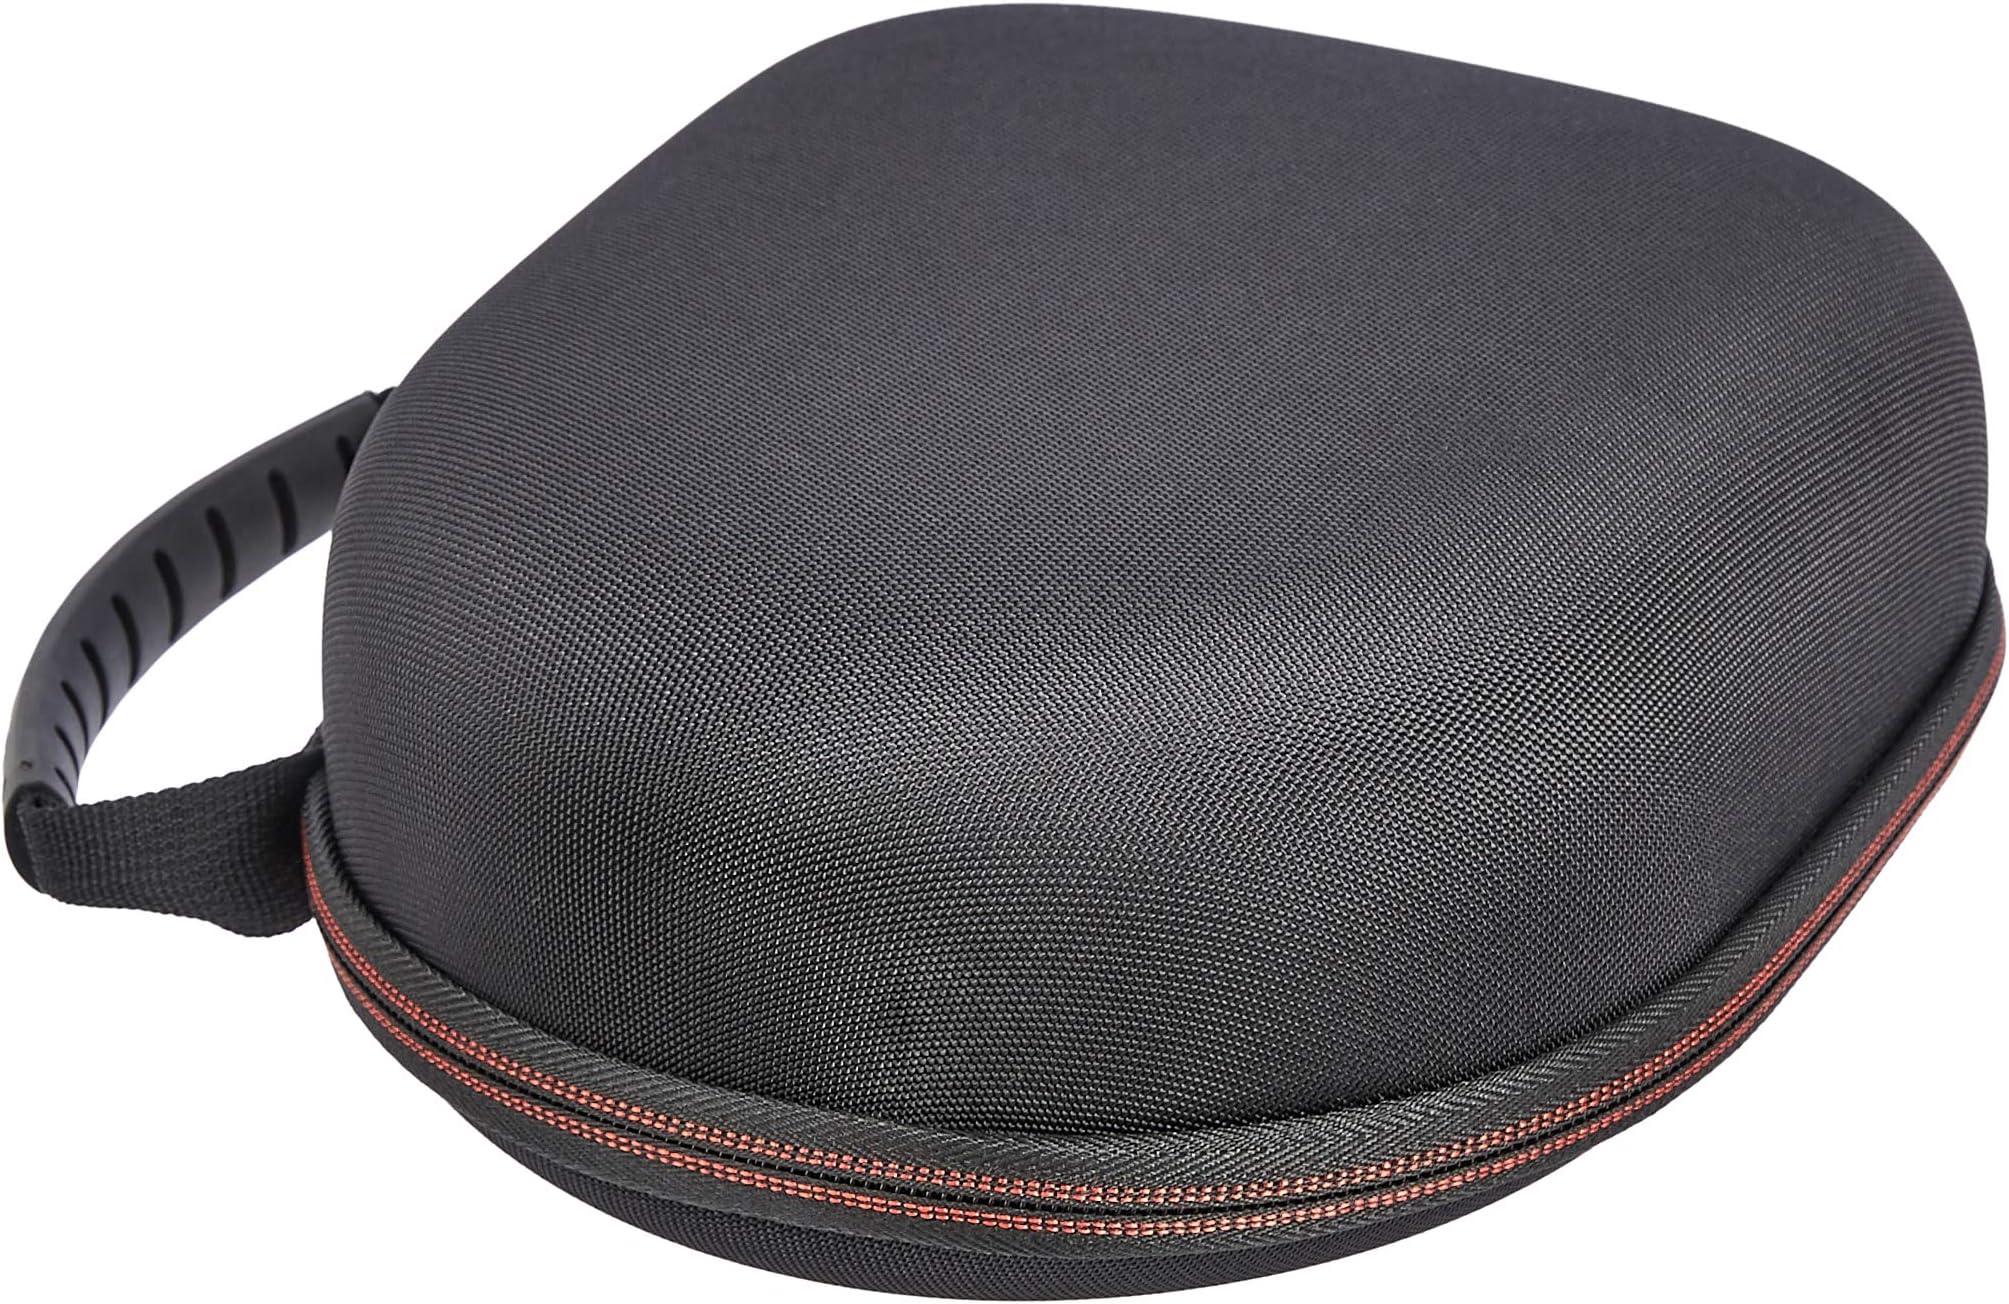 Amazon Basics Hard Headphone Carrying Case - Compatible with Audio-Technica Headphones, Black